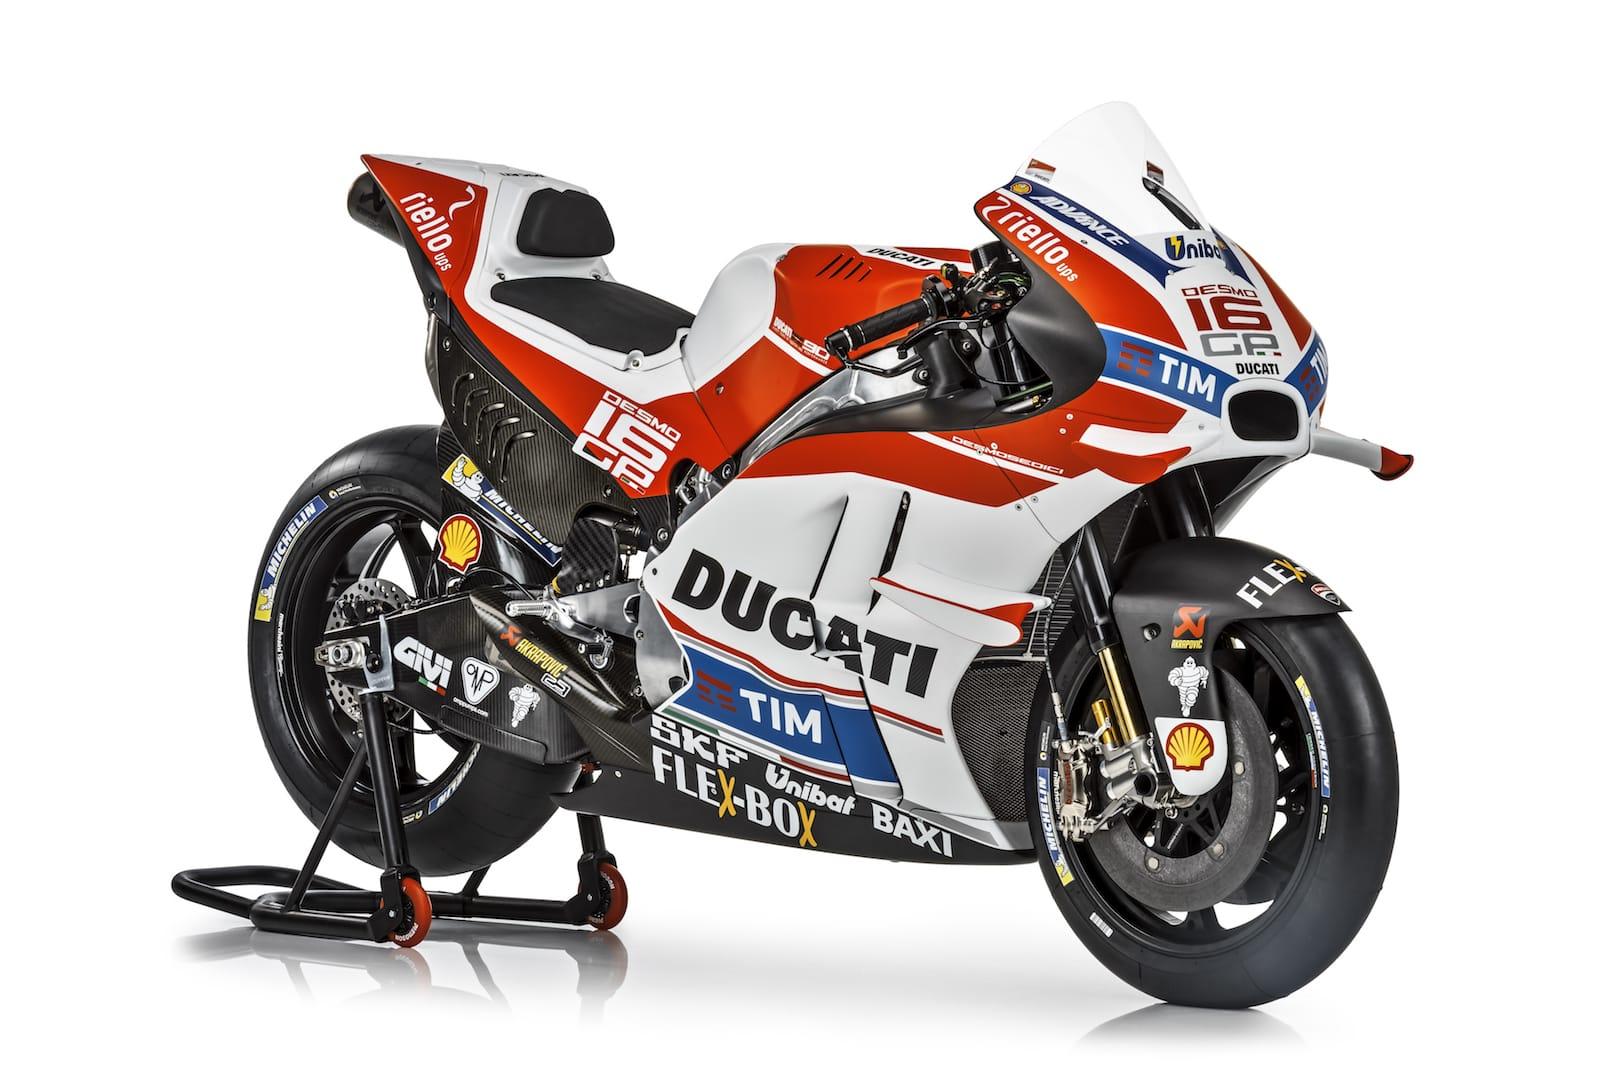 Фотогалерея: Ducati Desmosedici GP 2016